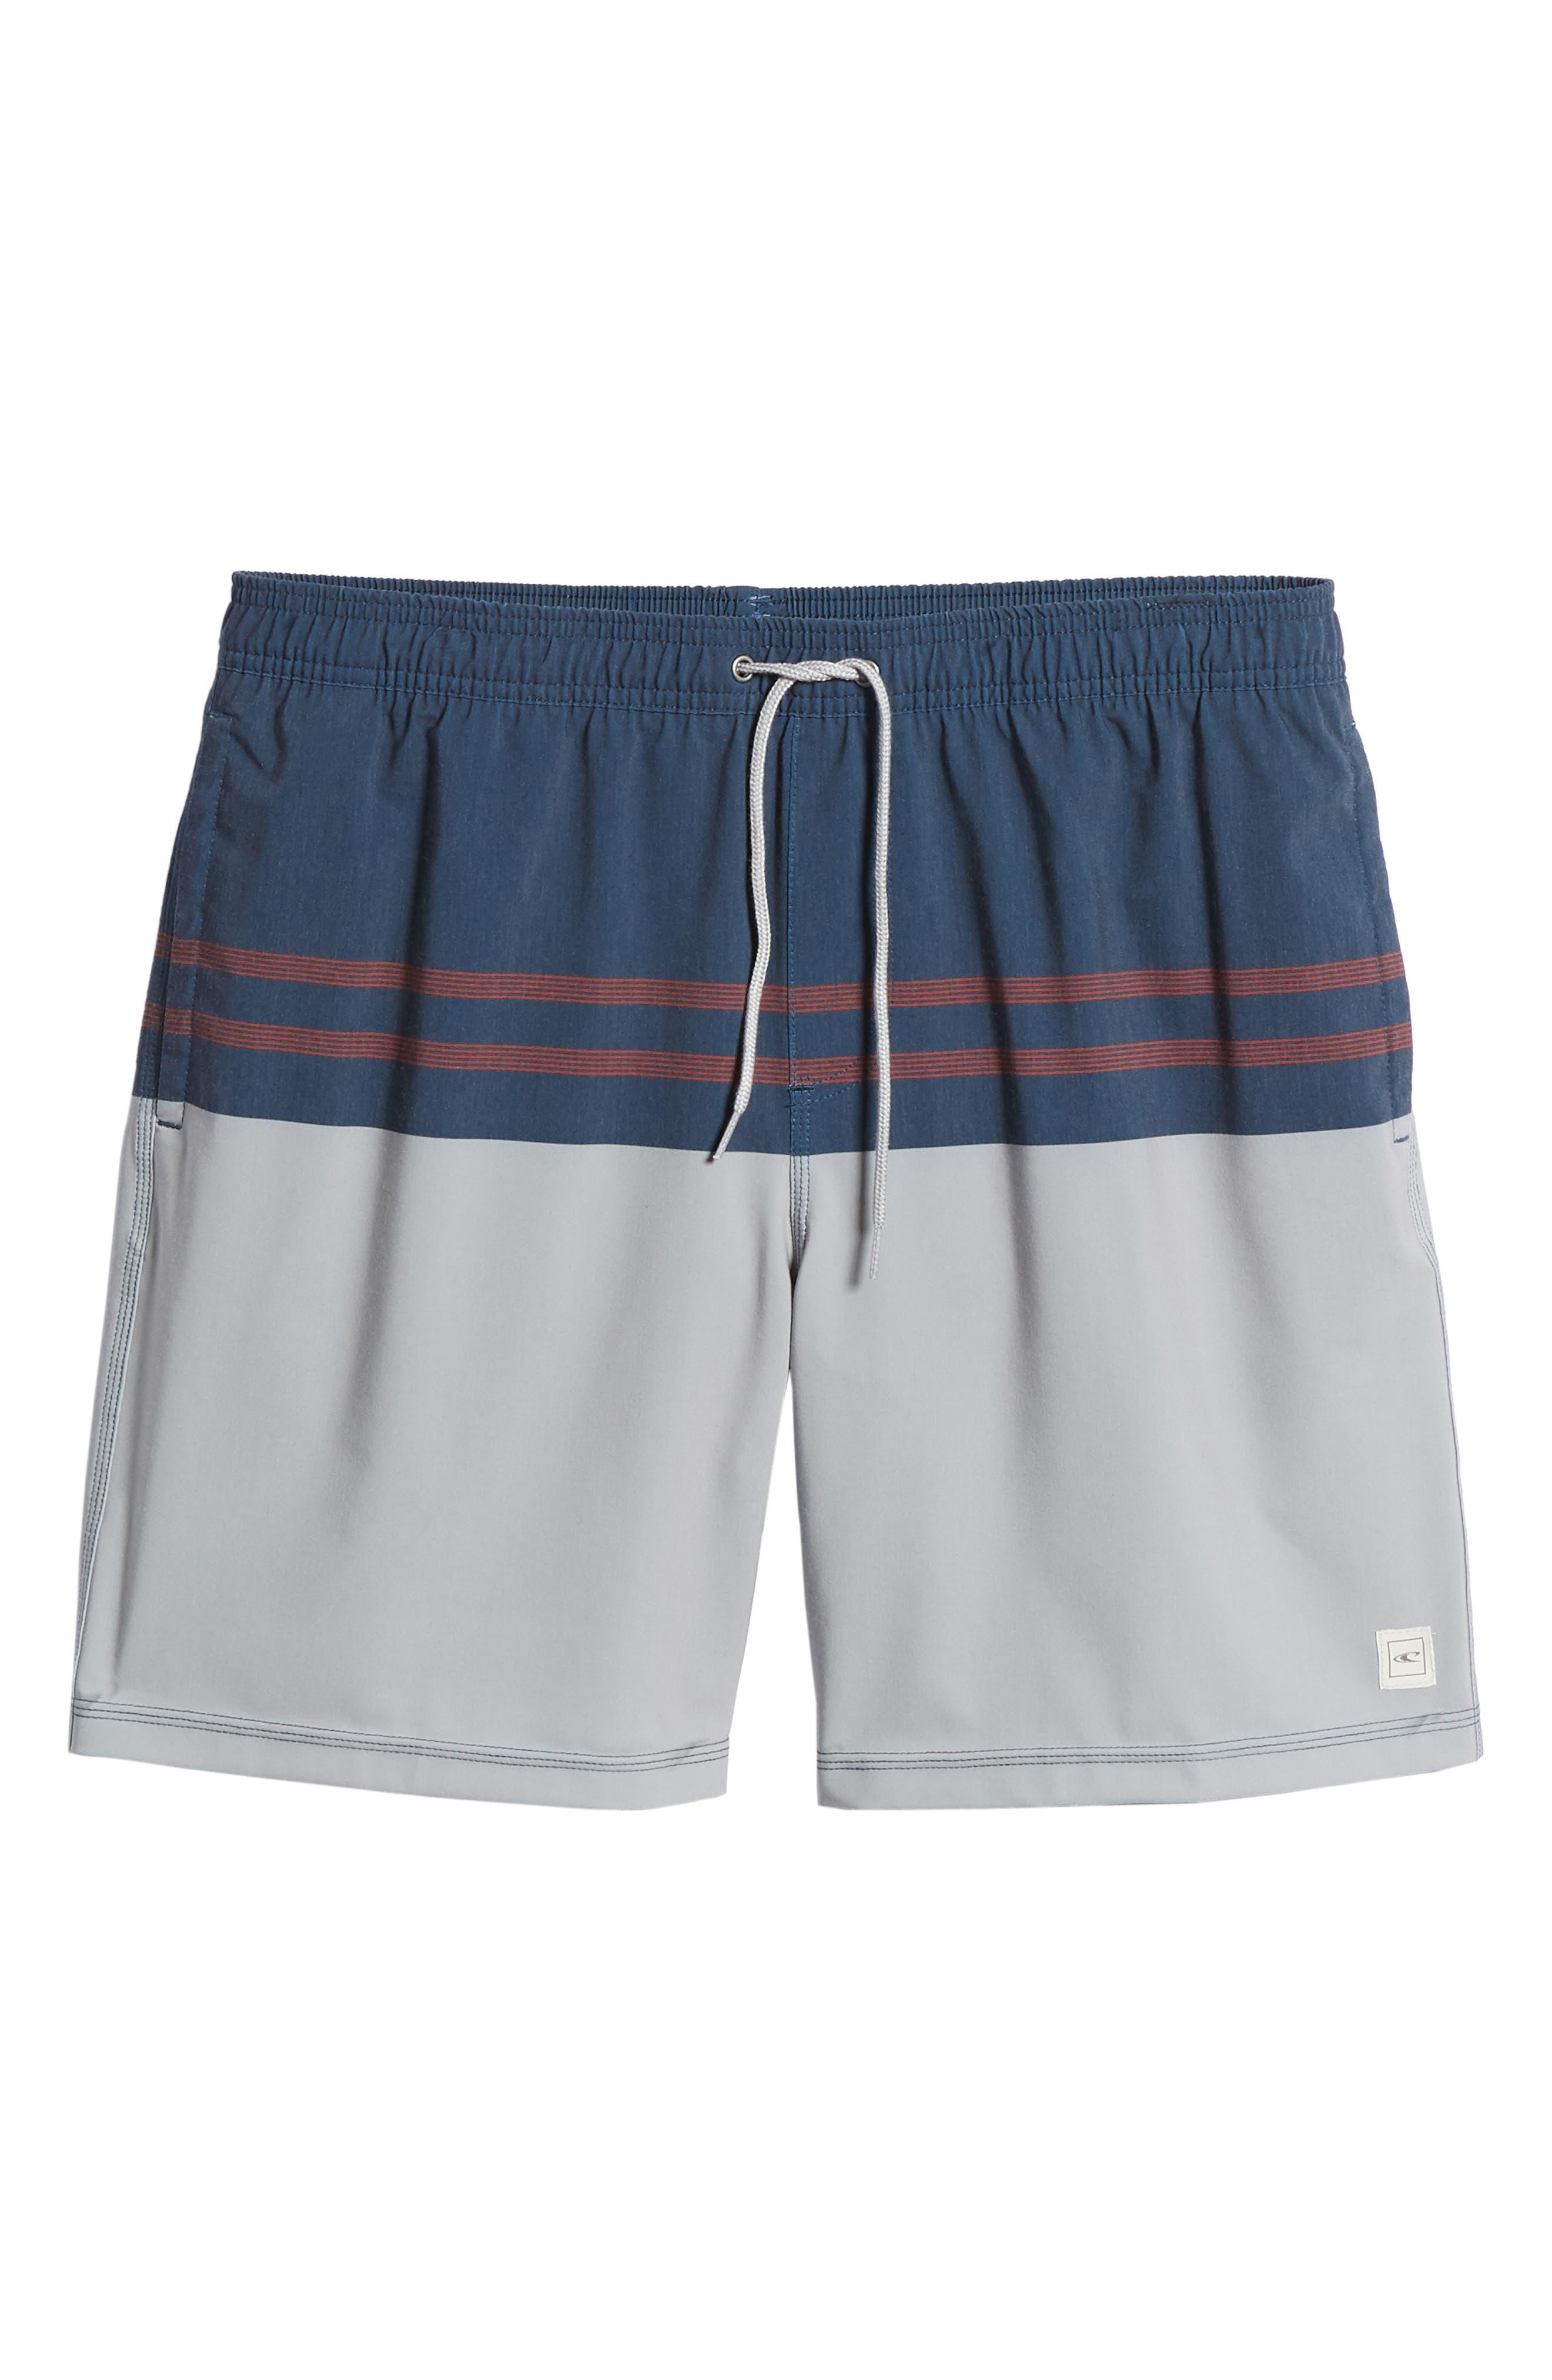 Pier Board Shorts,                             Alternate thumbnail 17, color,